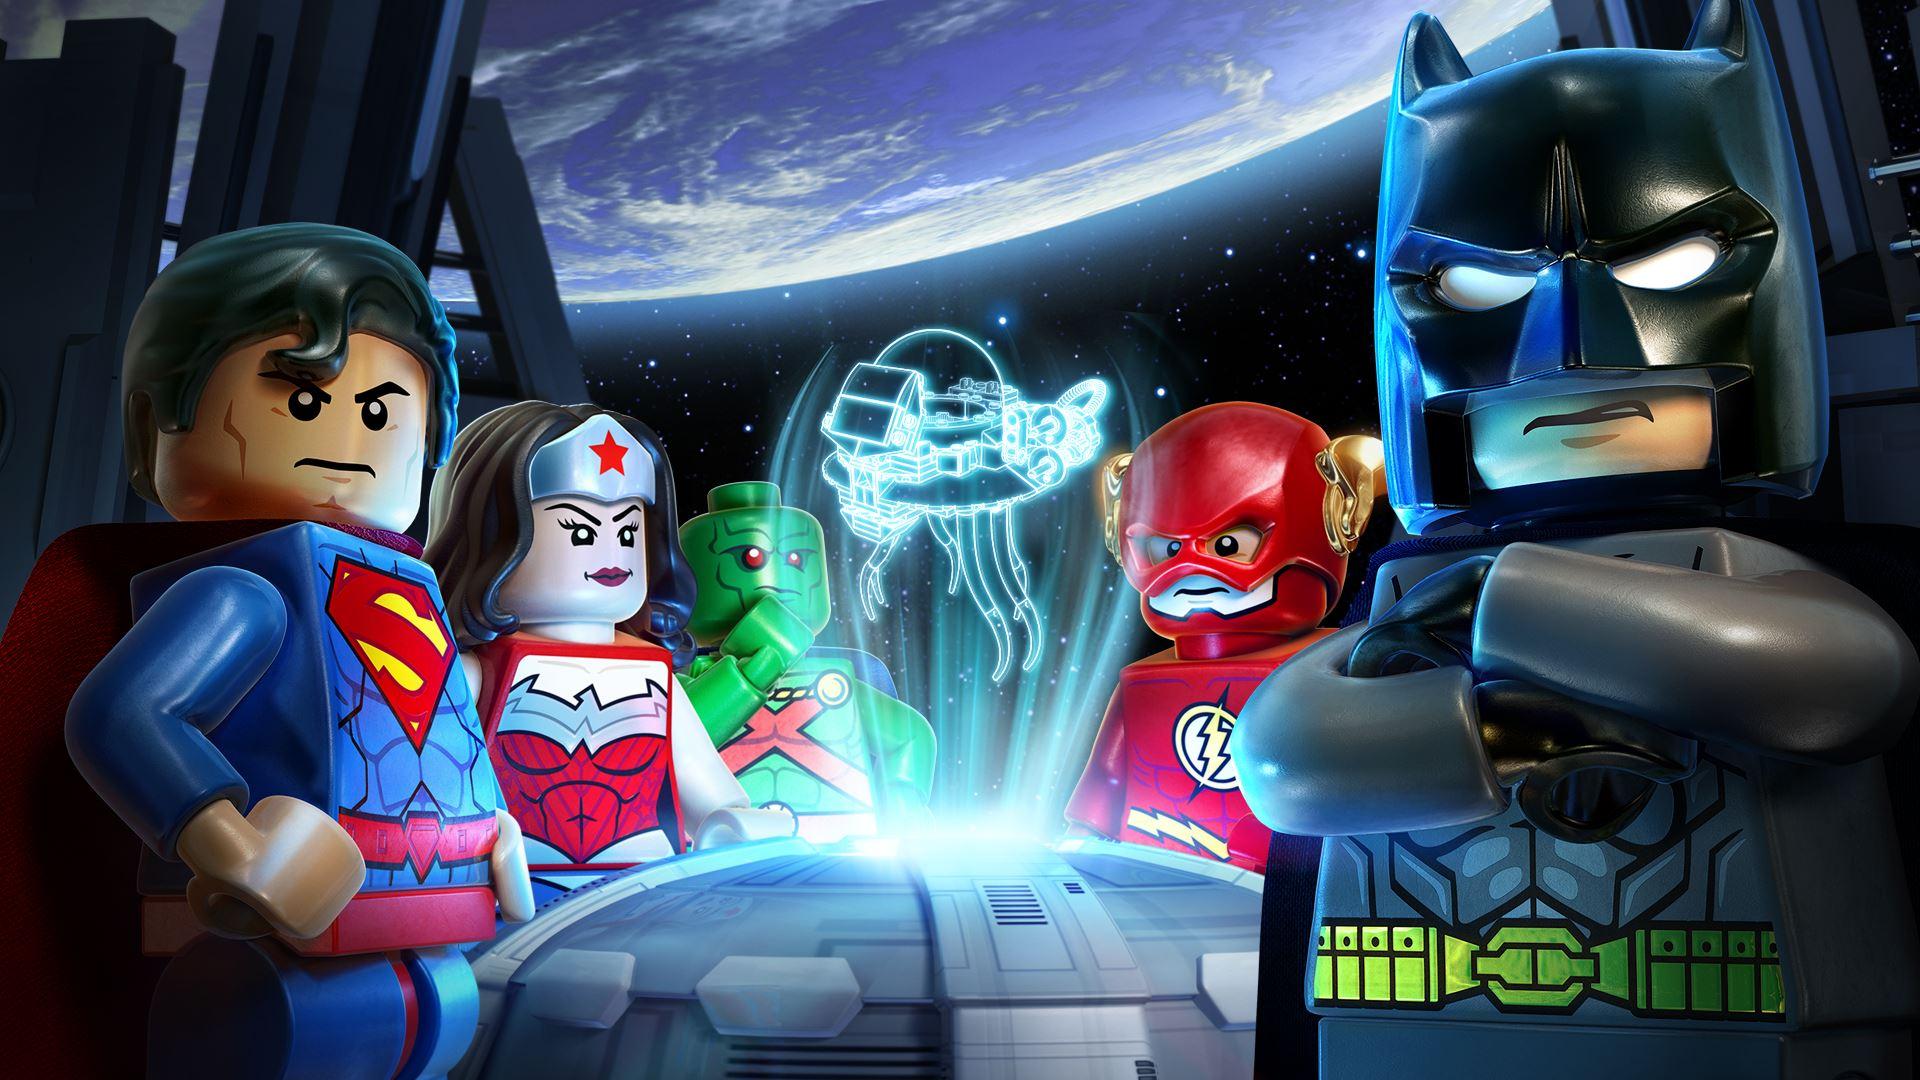 Xbox 360 Lego Batman 3 Game Save   Save Game File Download